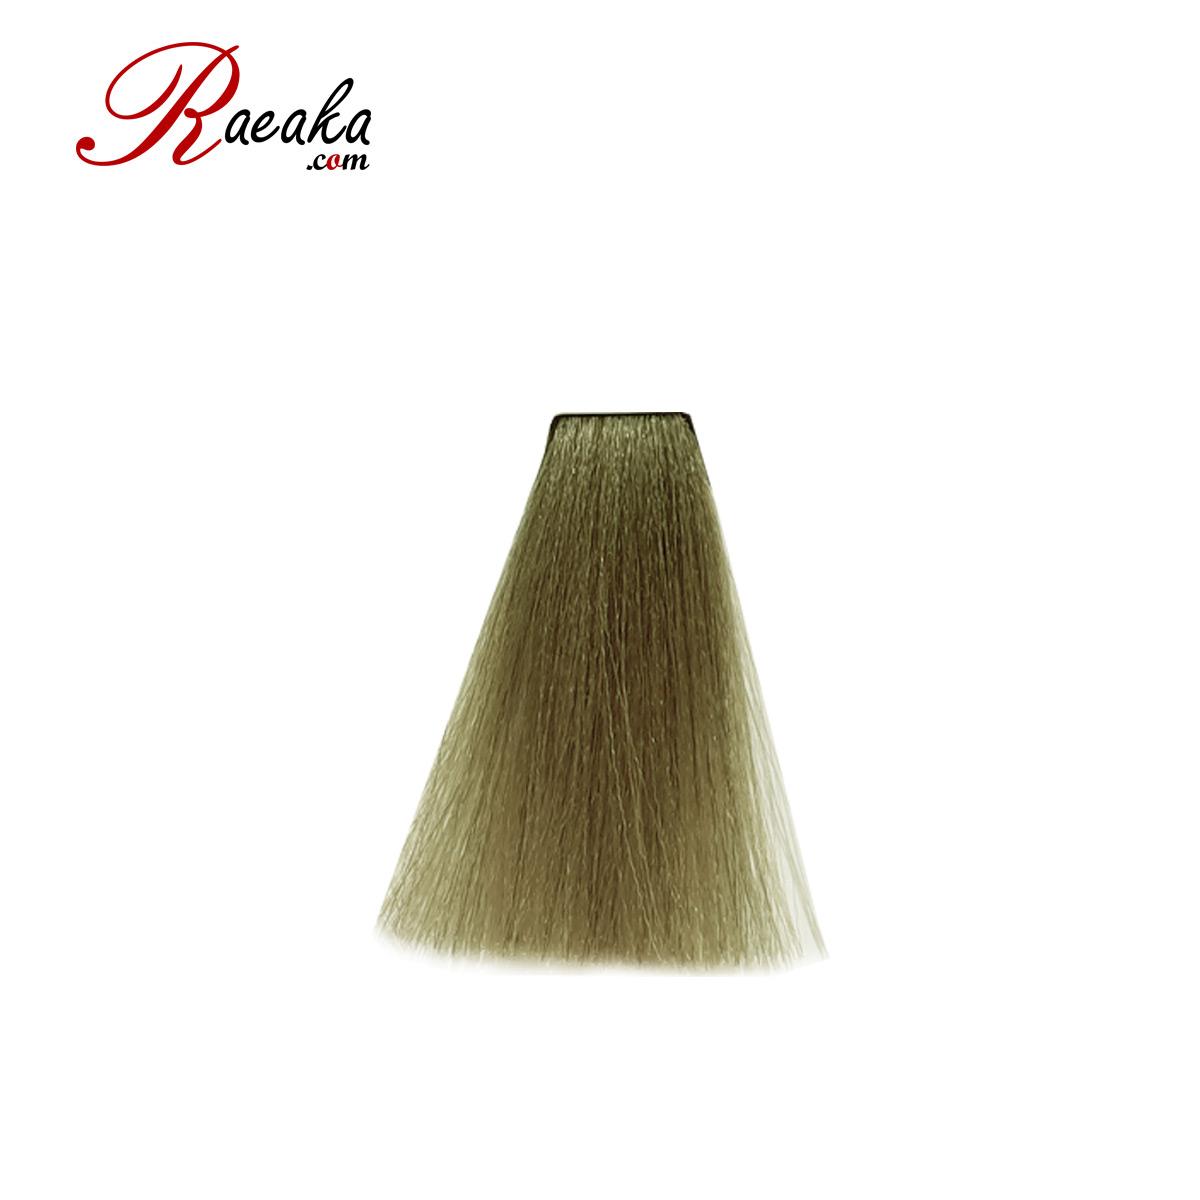 رنگ مو دوشس سری سدر شماره 71-6 حجم 125 میلی لیتر